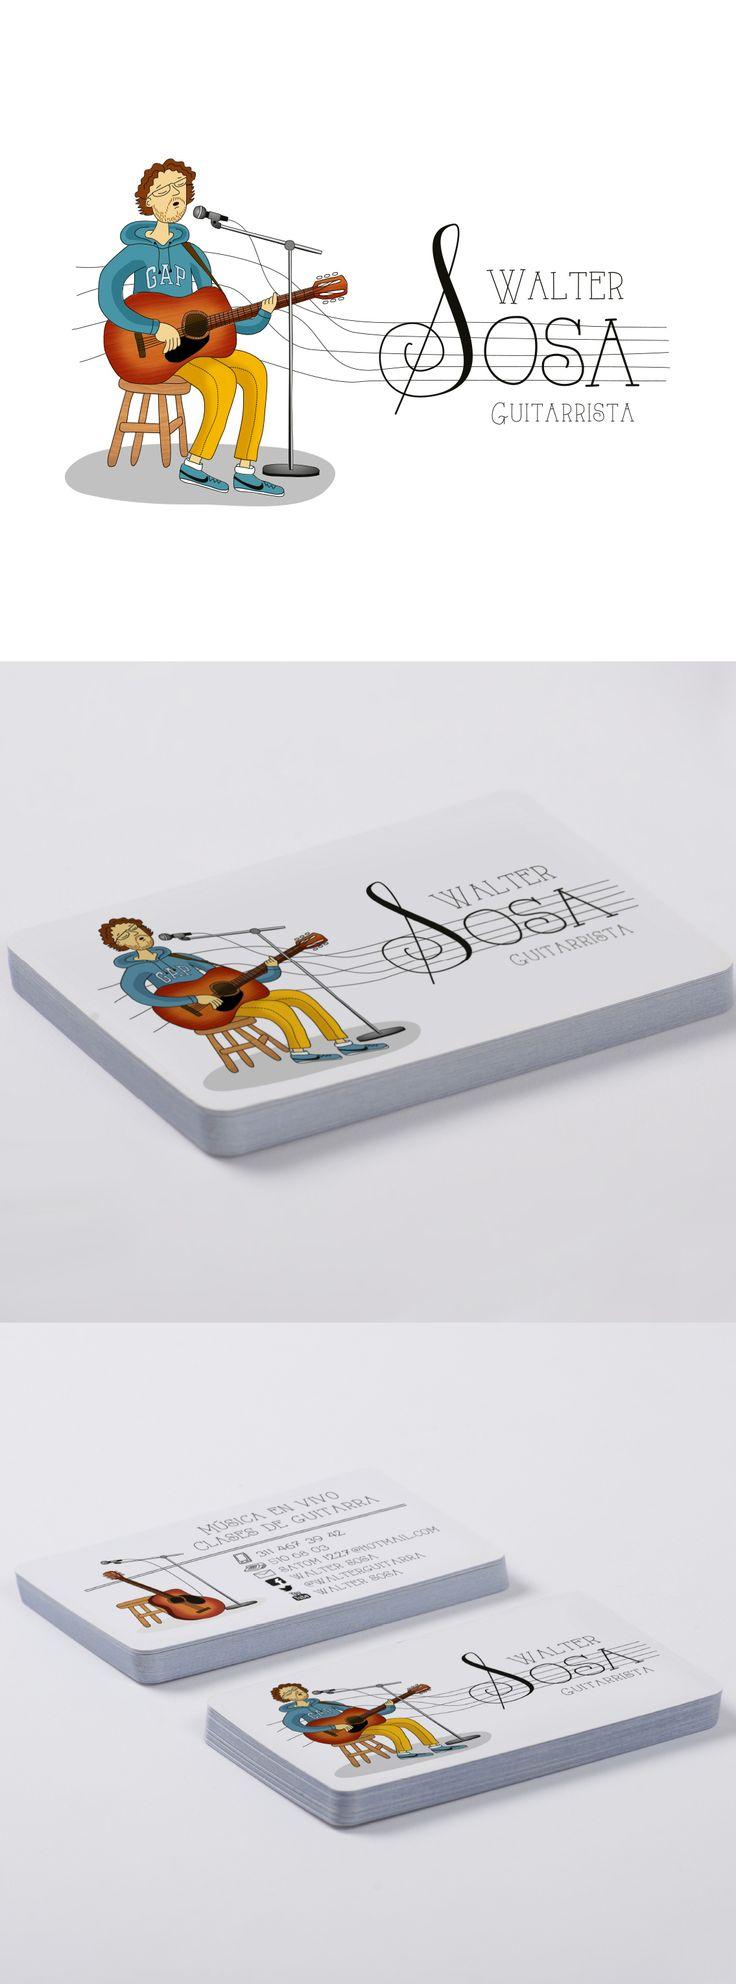 walter sosa #guitarrista #branddesign #ilustracion